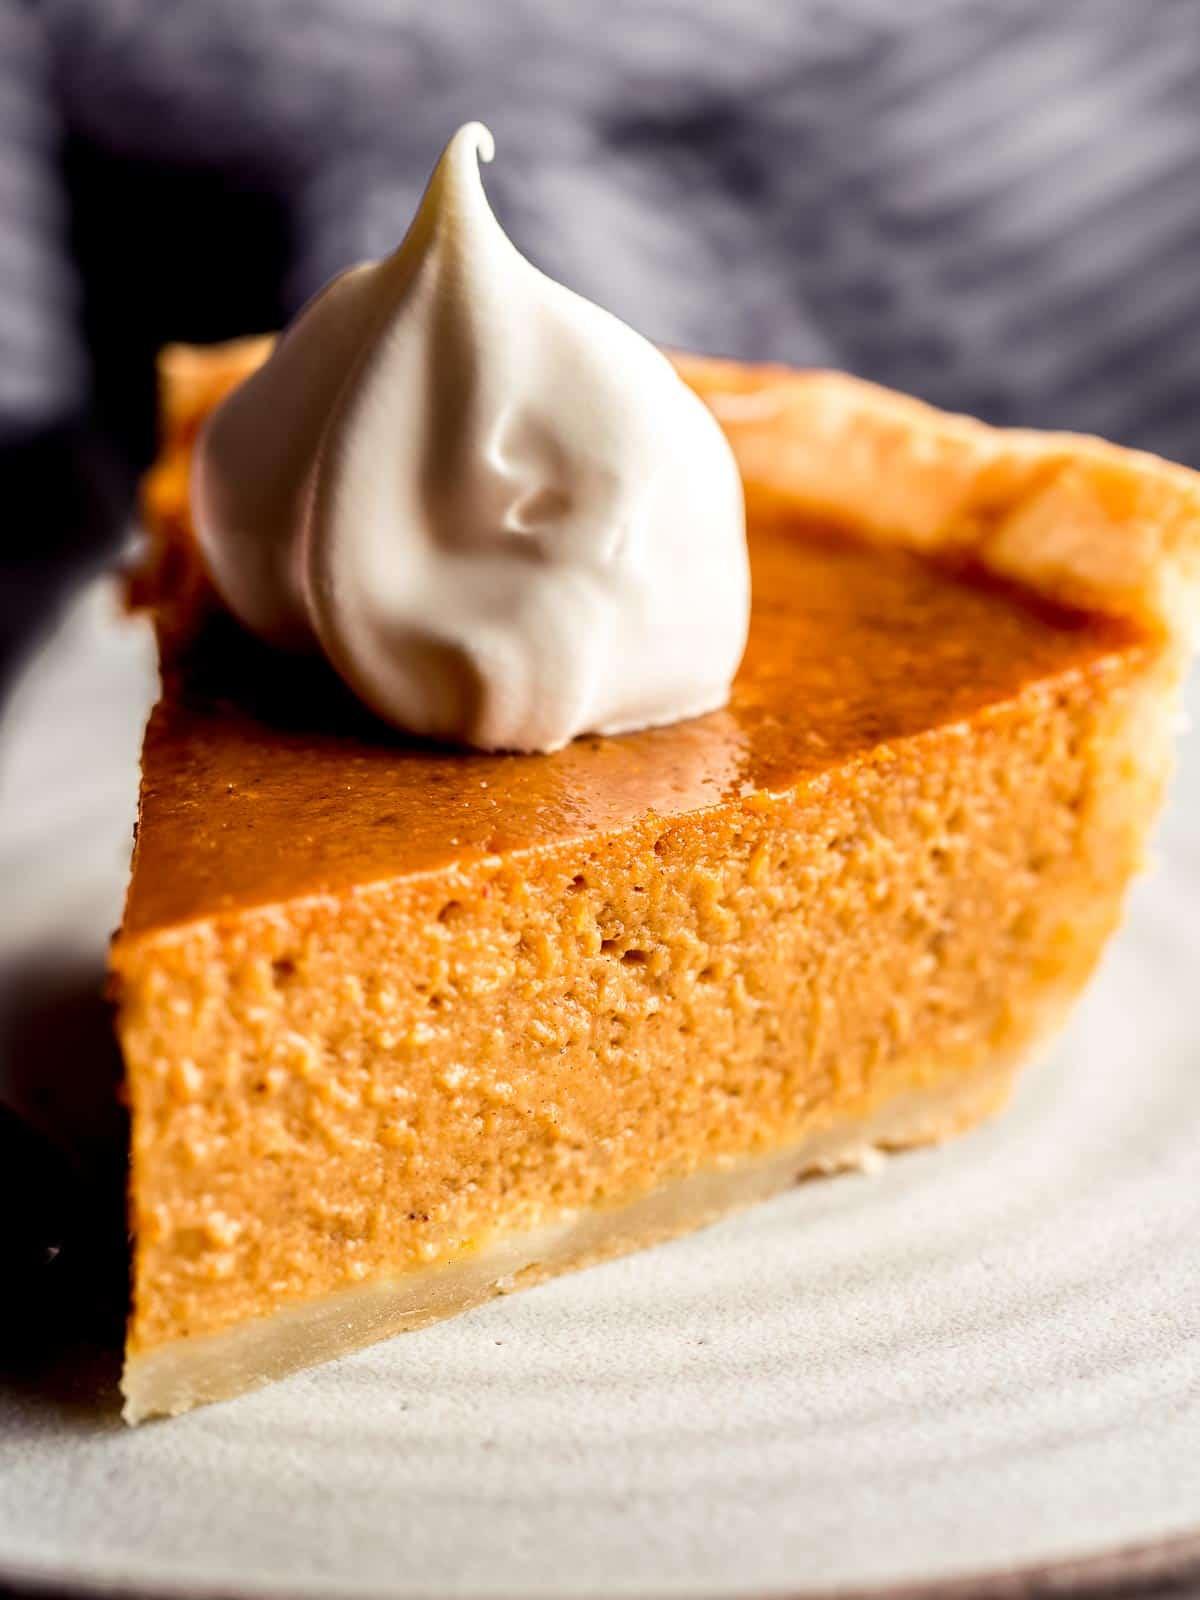 A slice of pumpkin pie recipe on a plate.